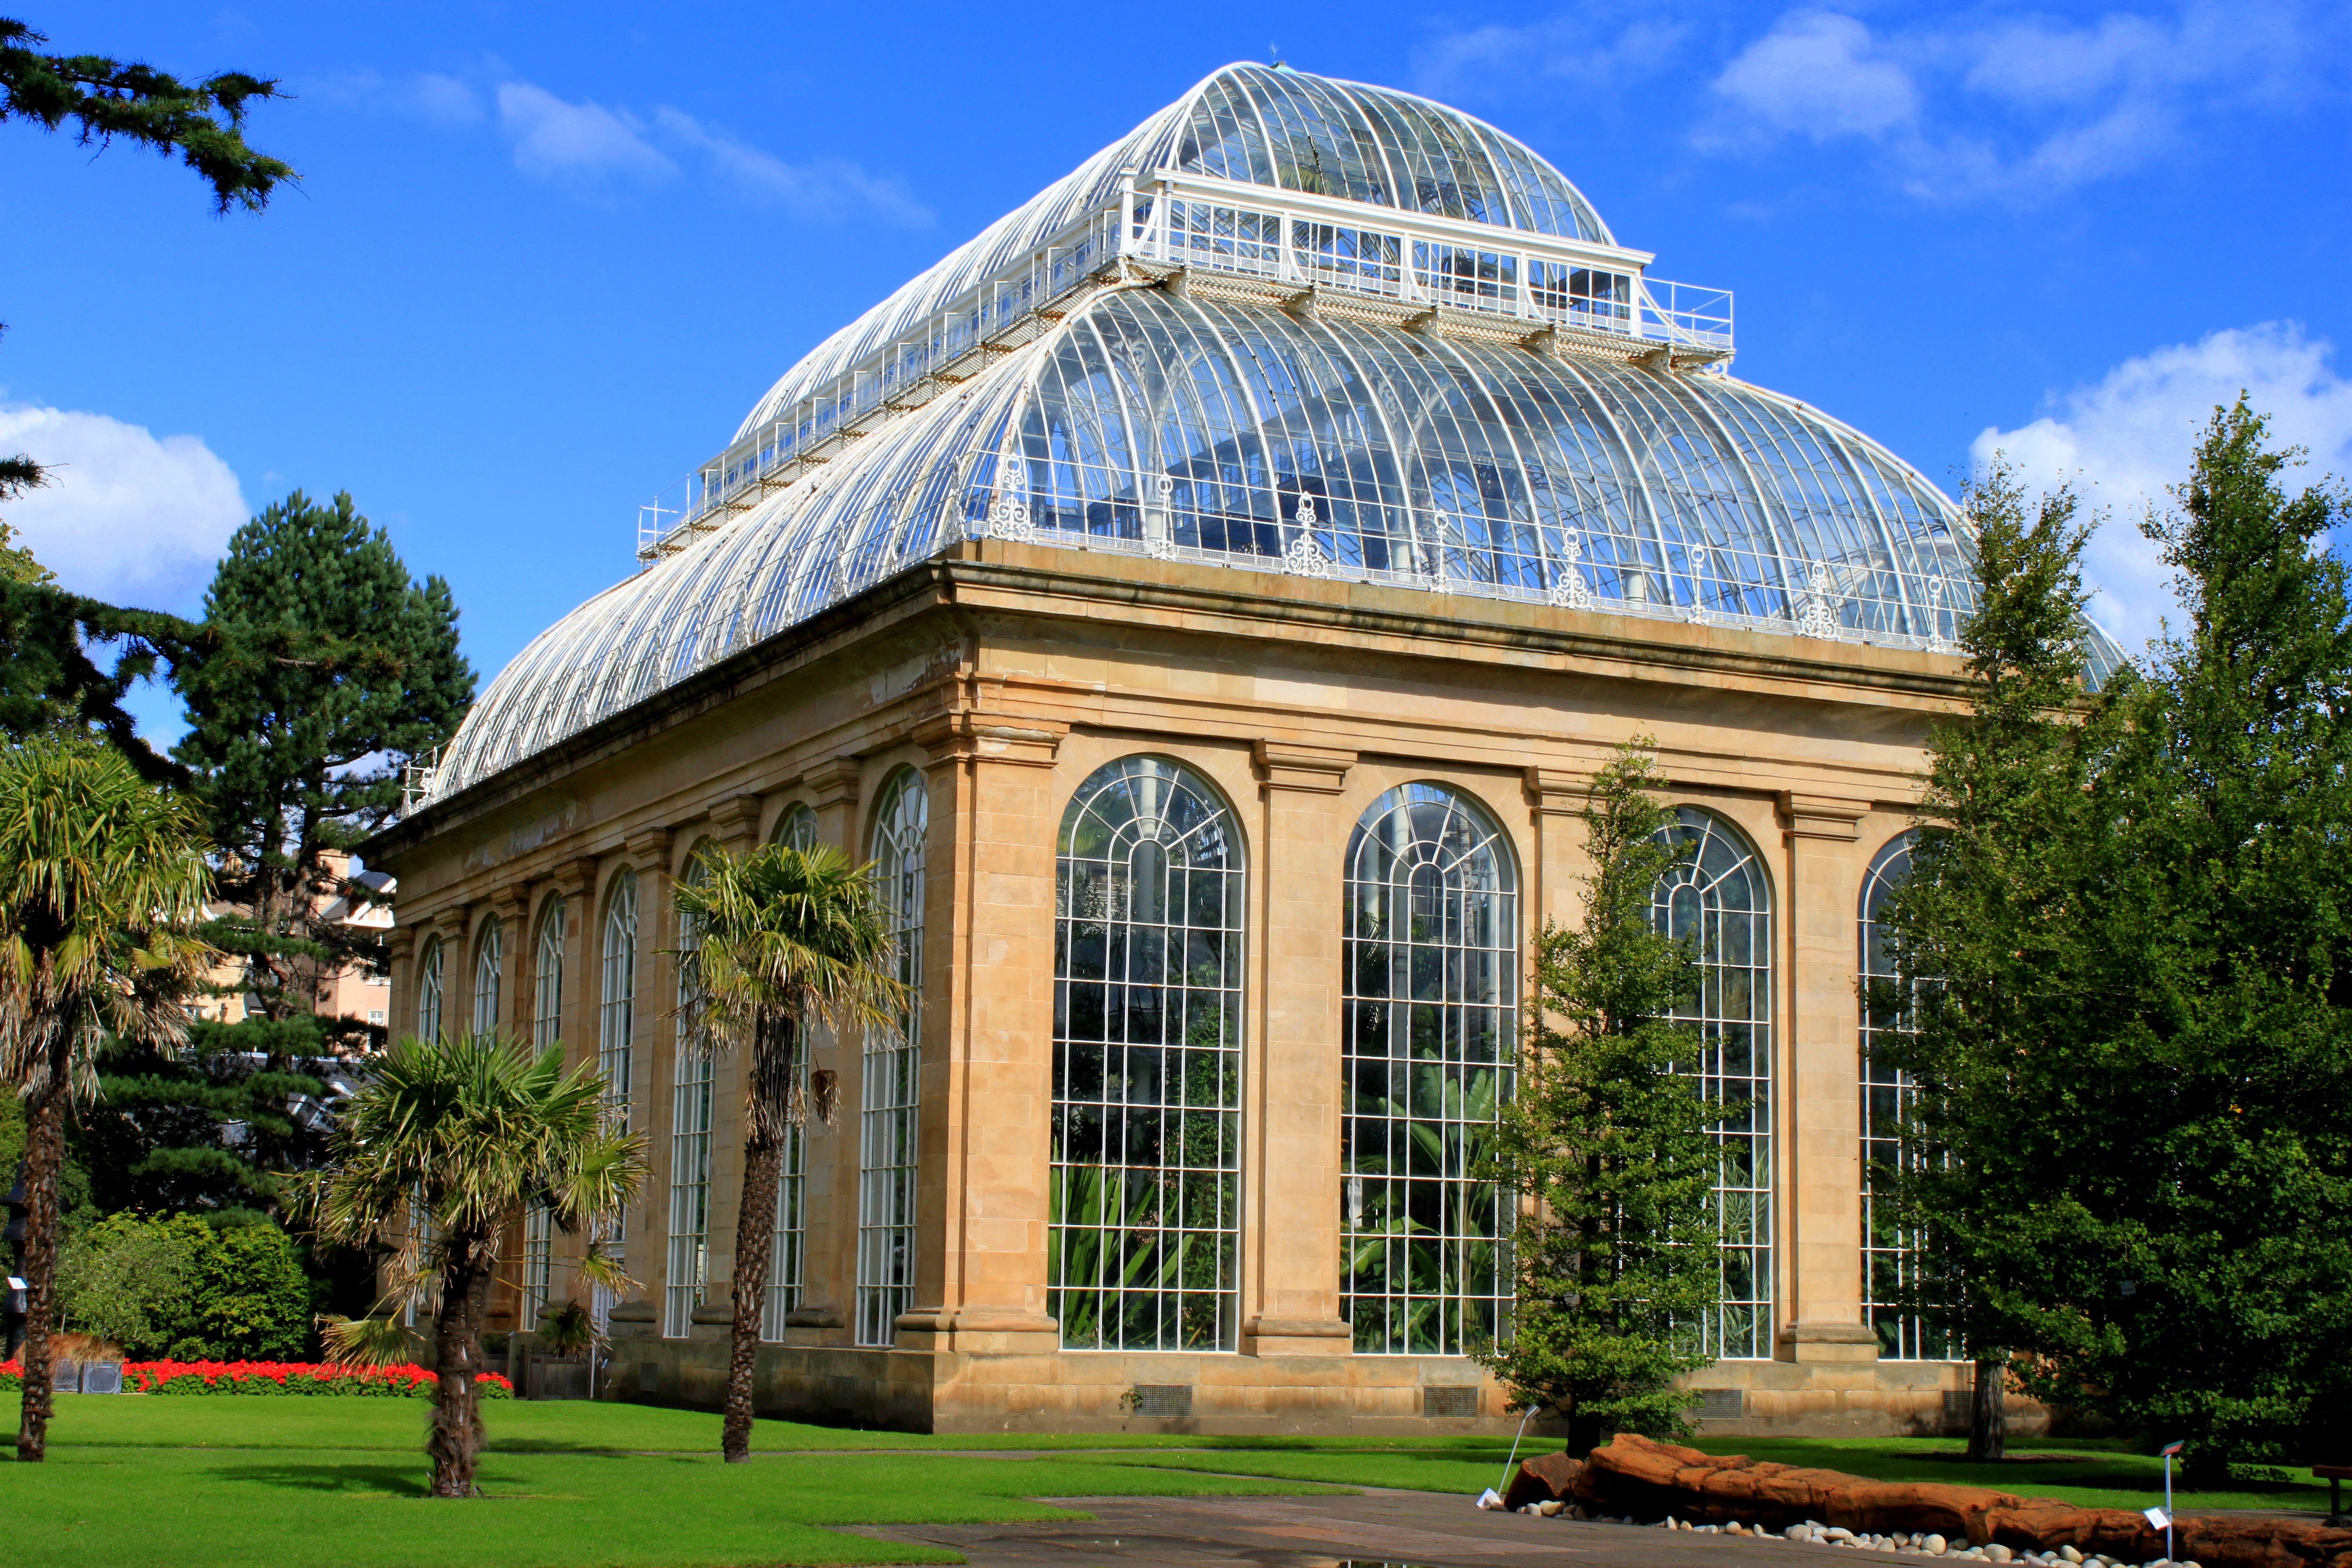 Royal Botanic Gardens Edinburgh Edinburgh Buildings Pinterest